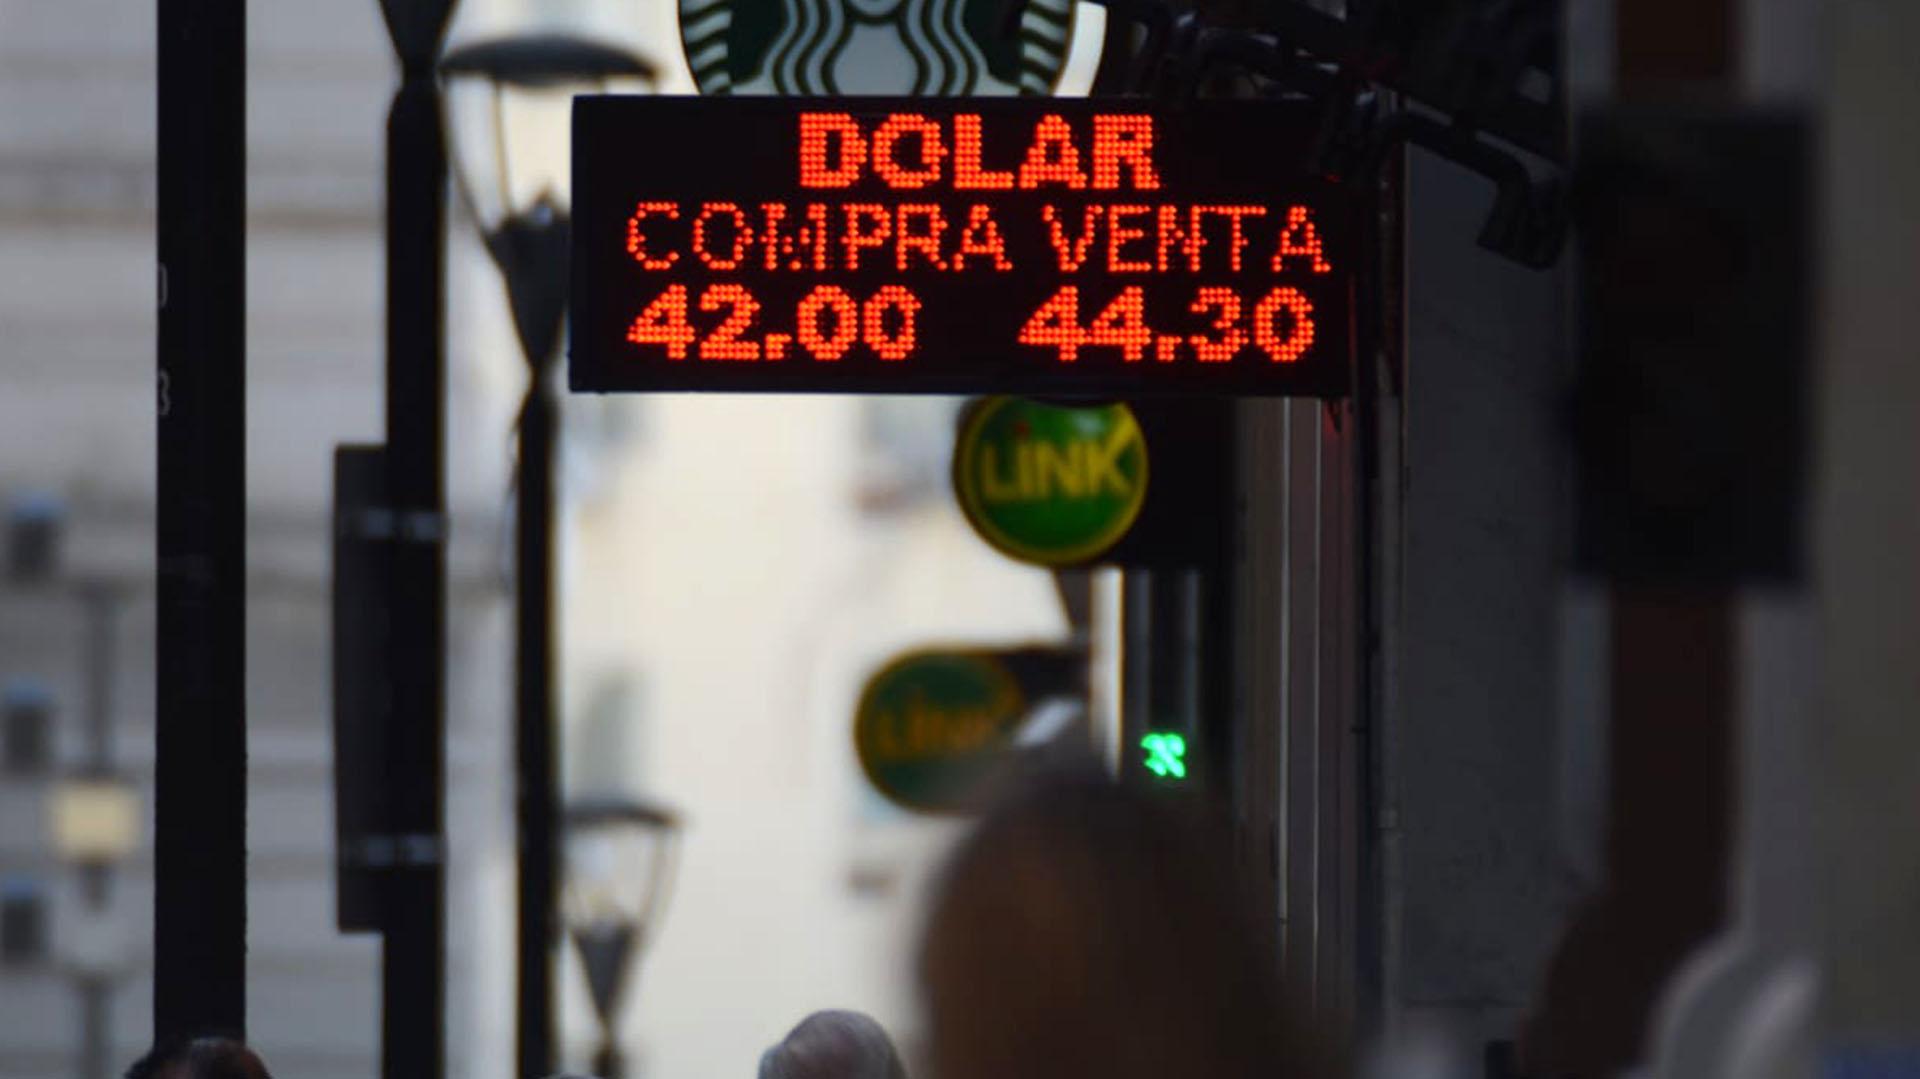 Sube el dólar por segunda jornada consecutiva (Foto: Franco Fafassuli)